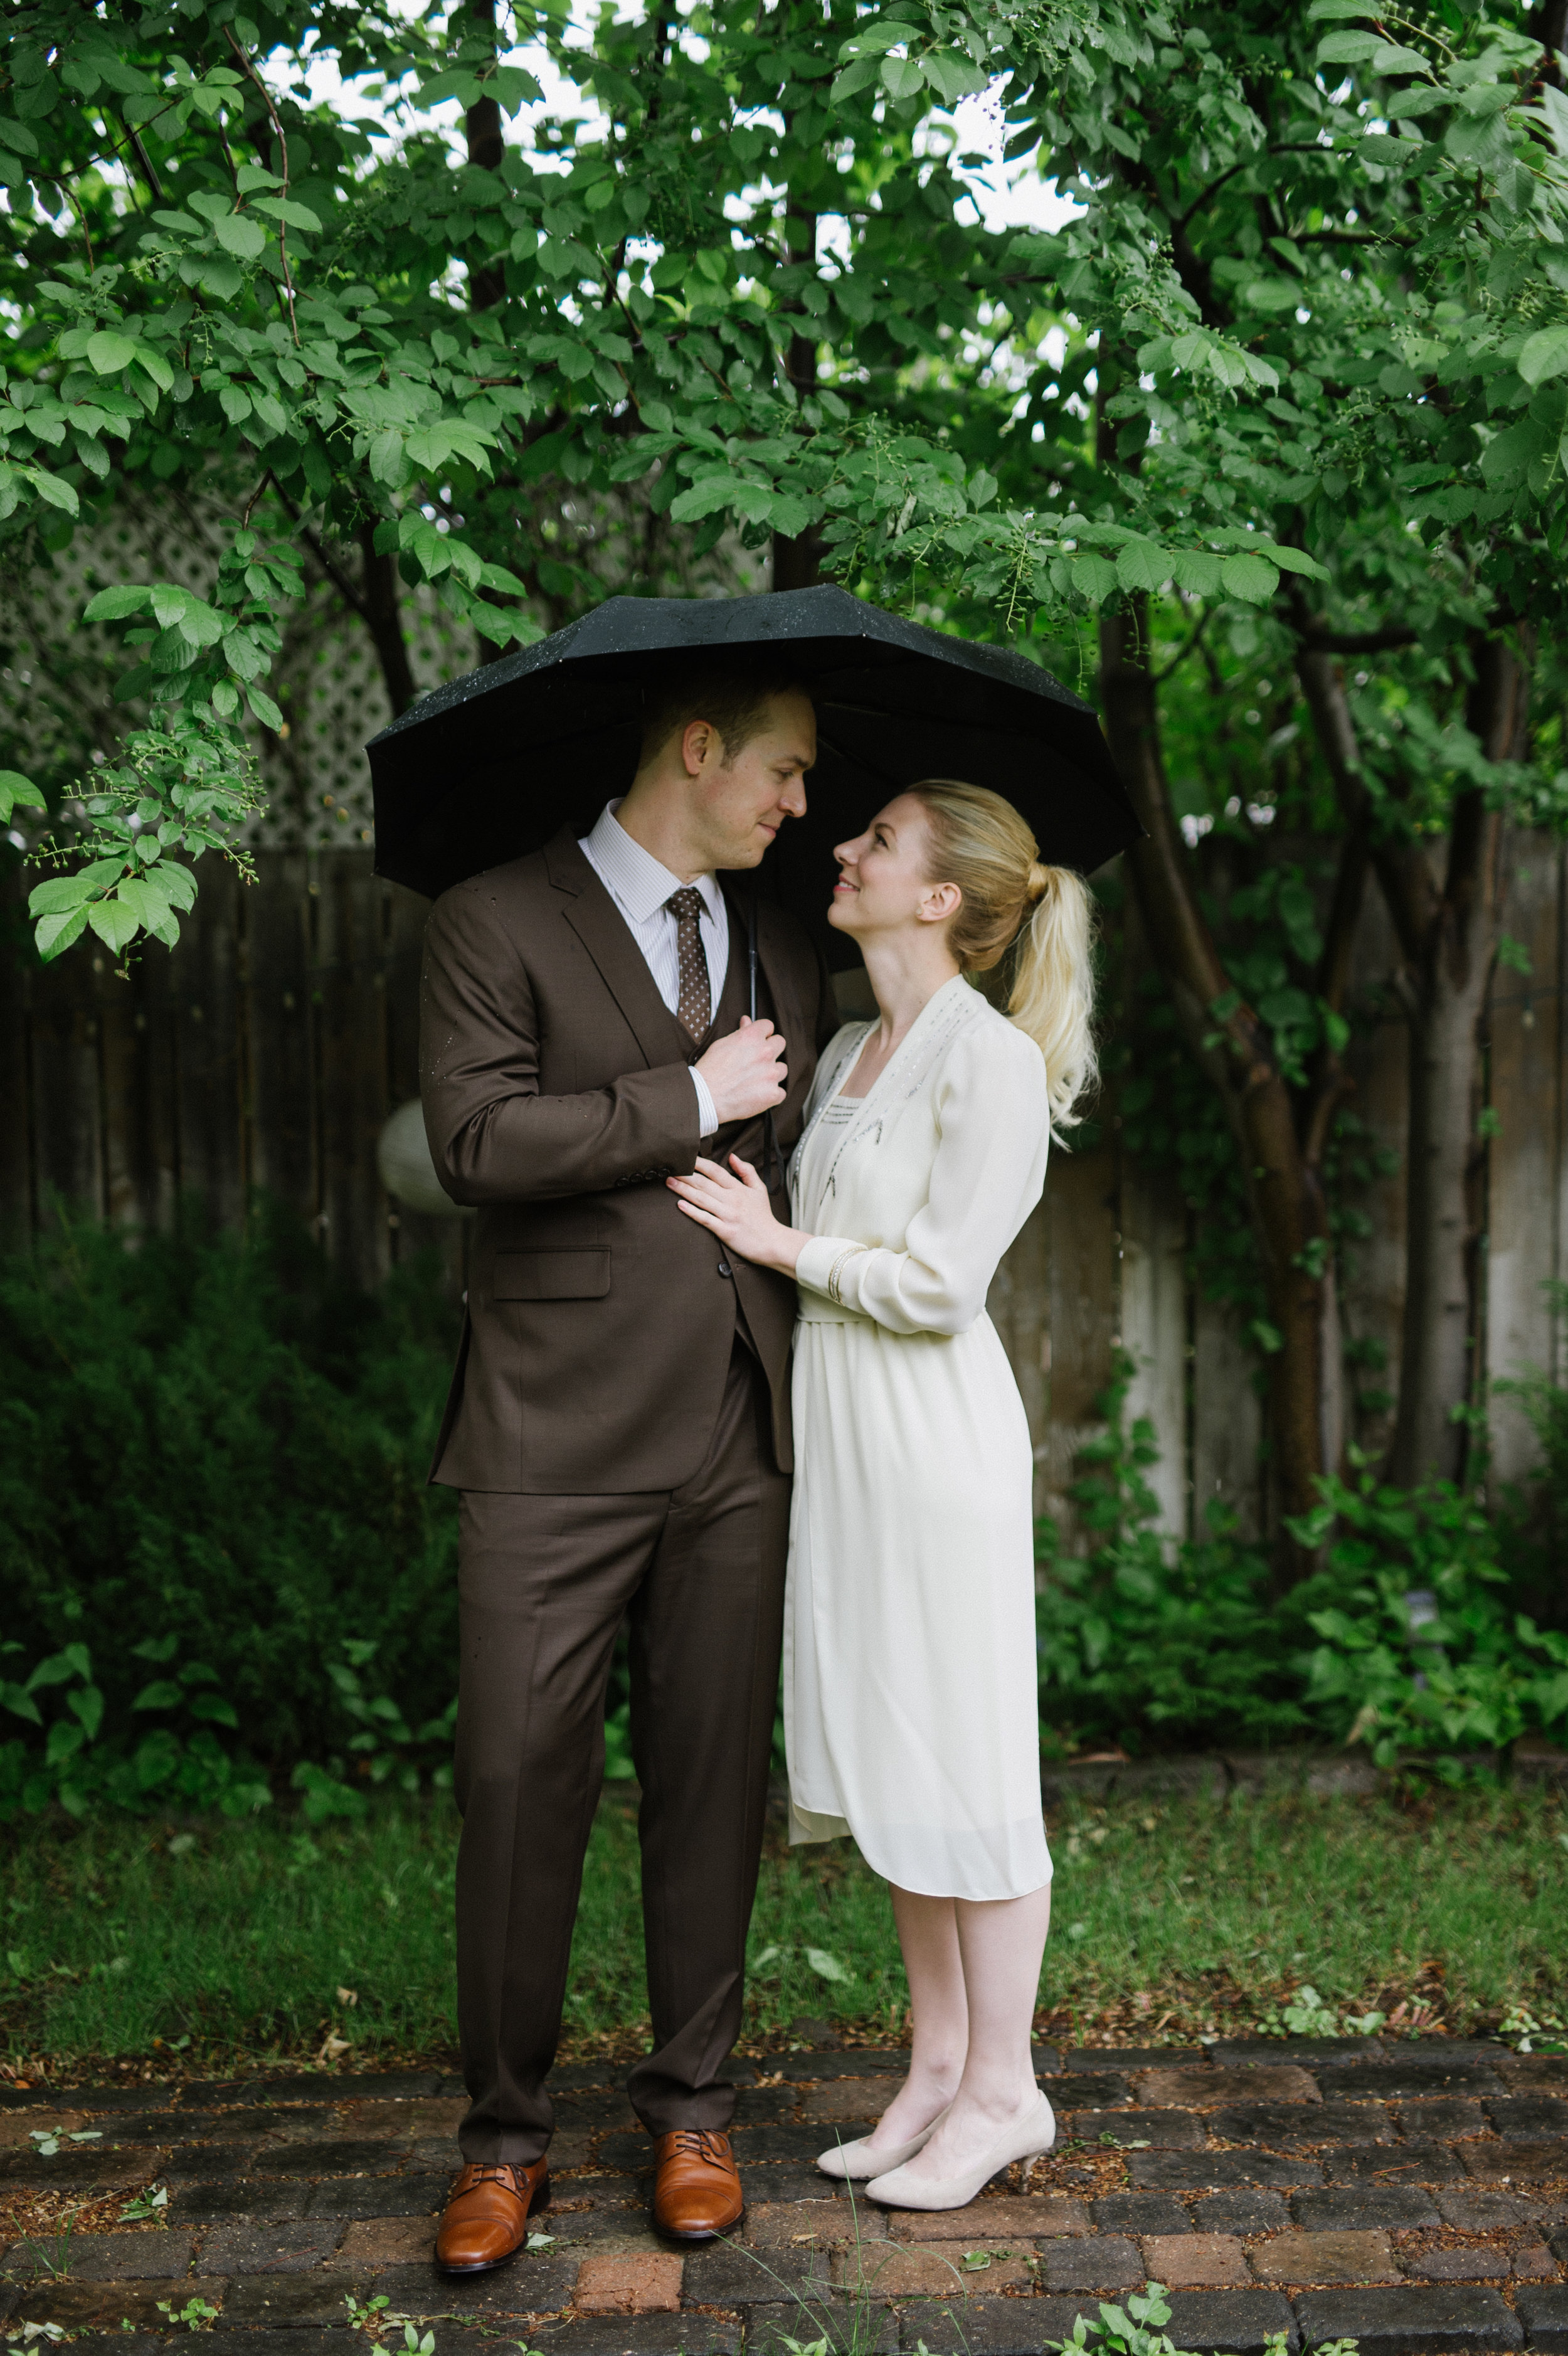 Teatro_Wedding_Calgary_Wedding_Photography_Vanessa_Tom_Married_2018_HR006.jpg